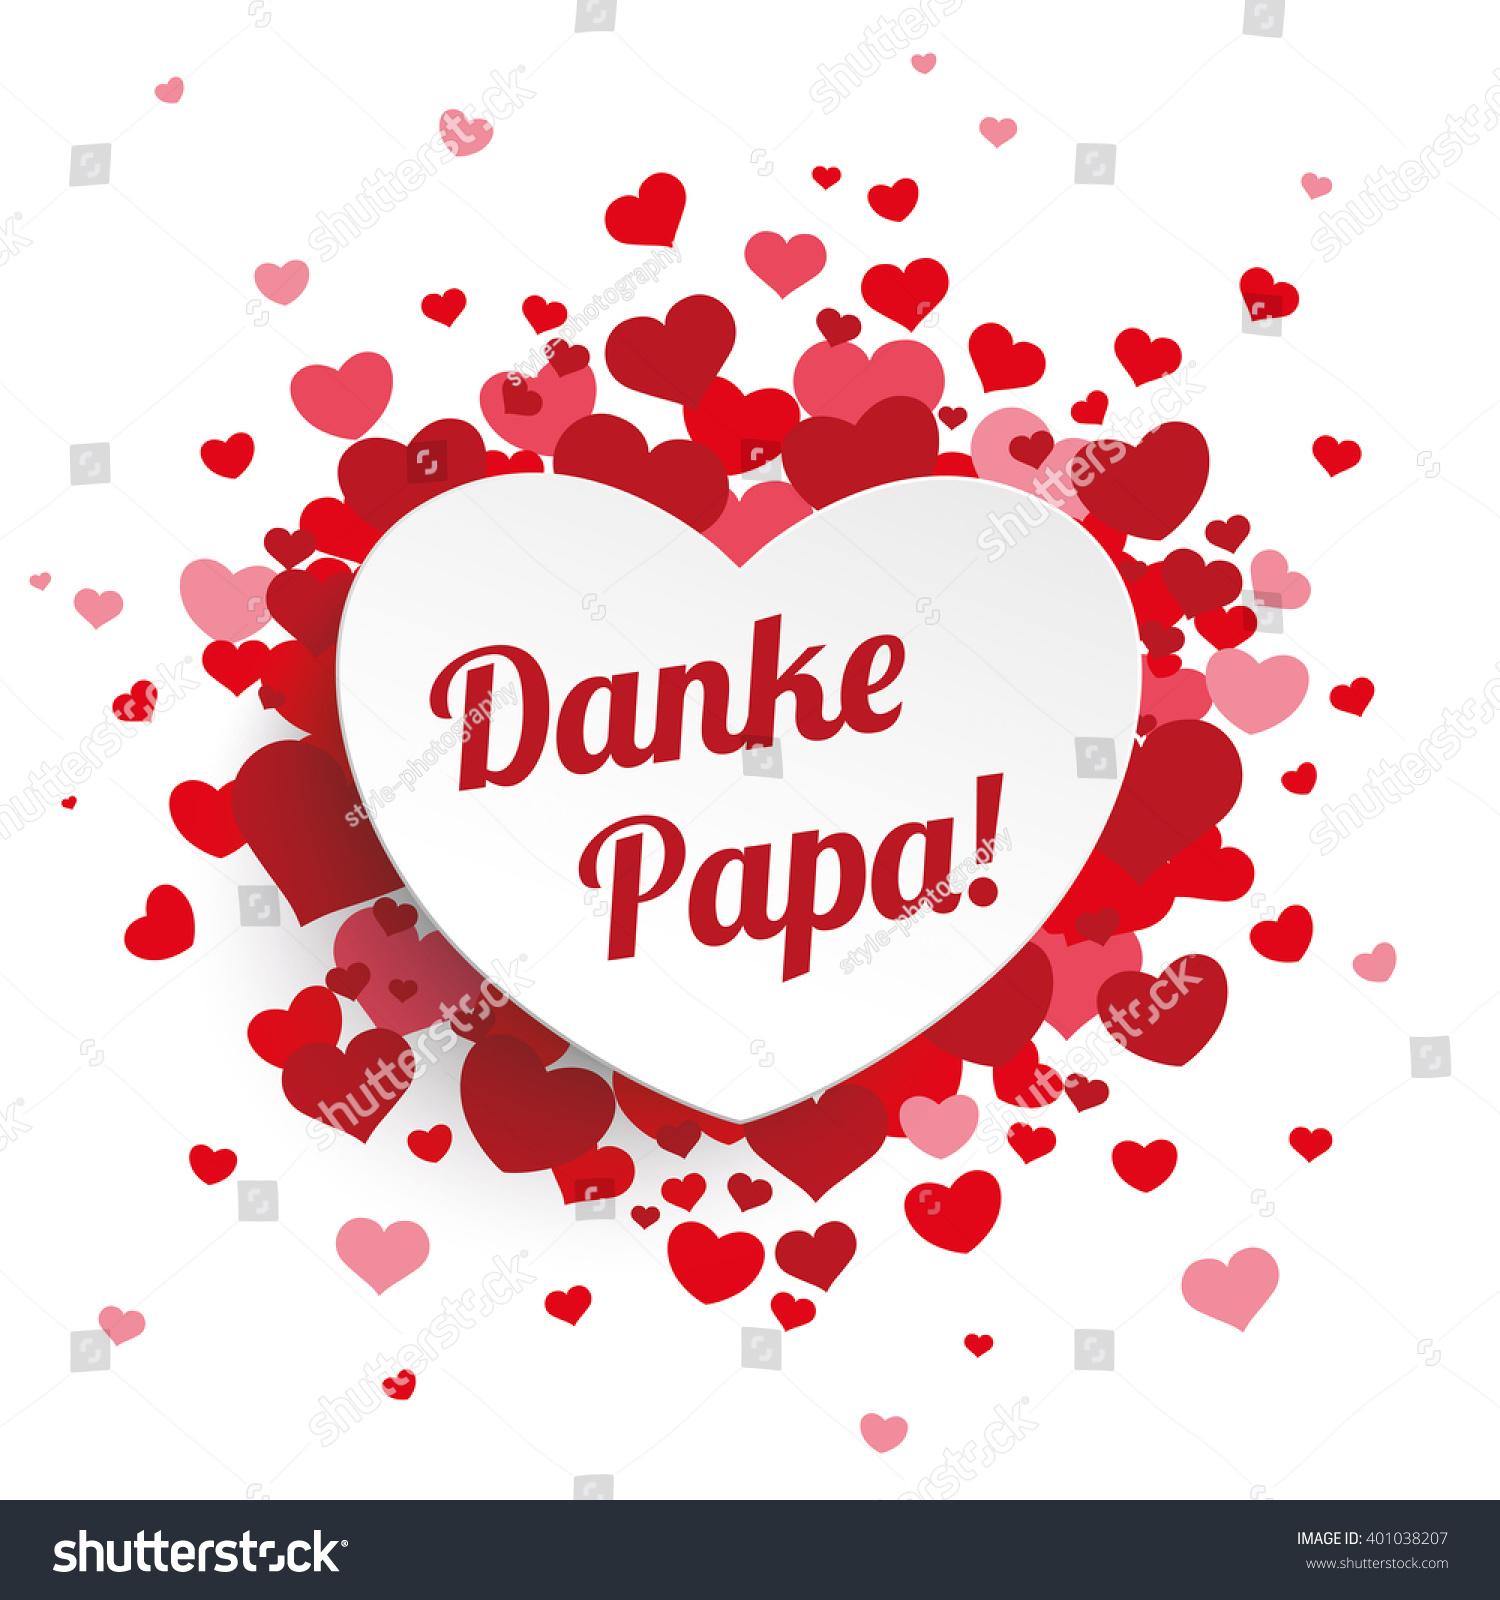 Danke Papa Text : german text danke papa translate thank you dad eps 10 vector file 401038207 shutterstock ~ Watch28wear.com Haus und Dekorationen